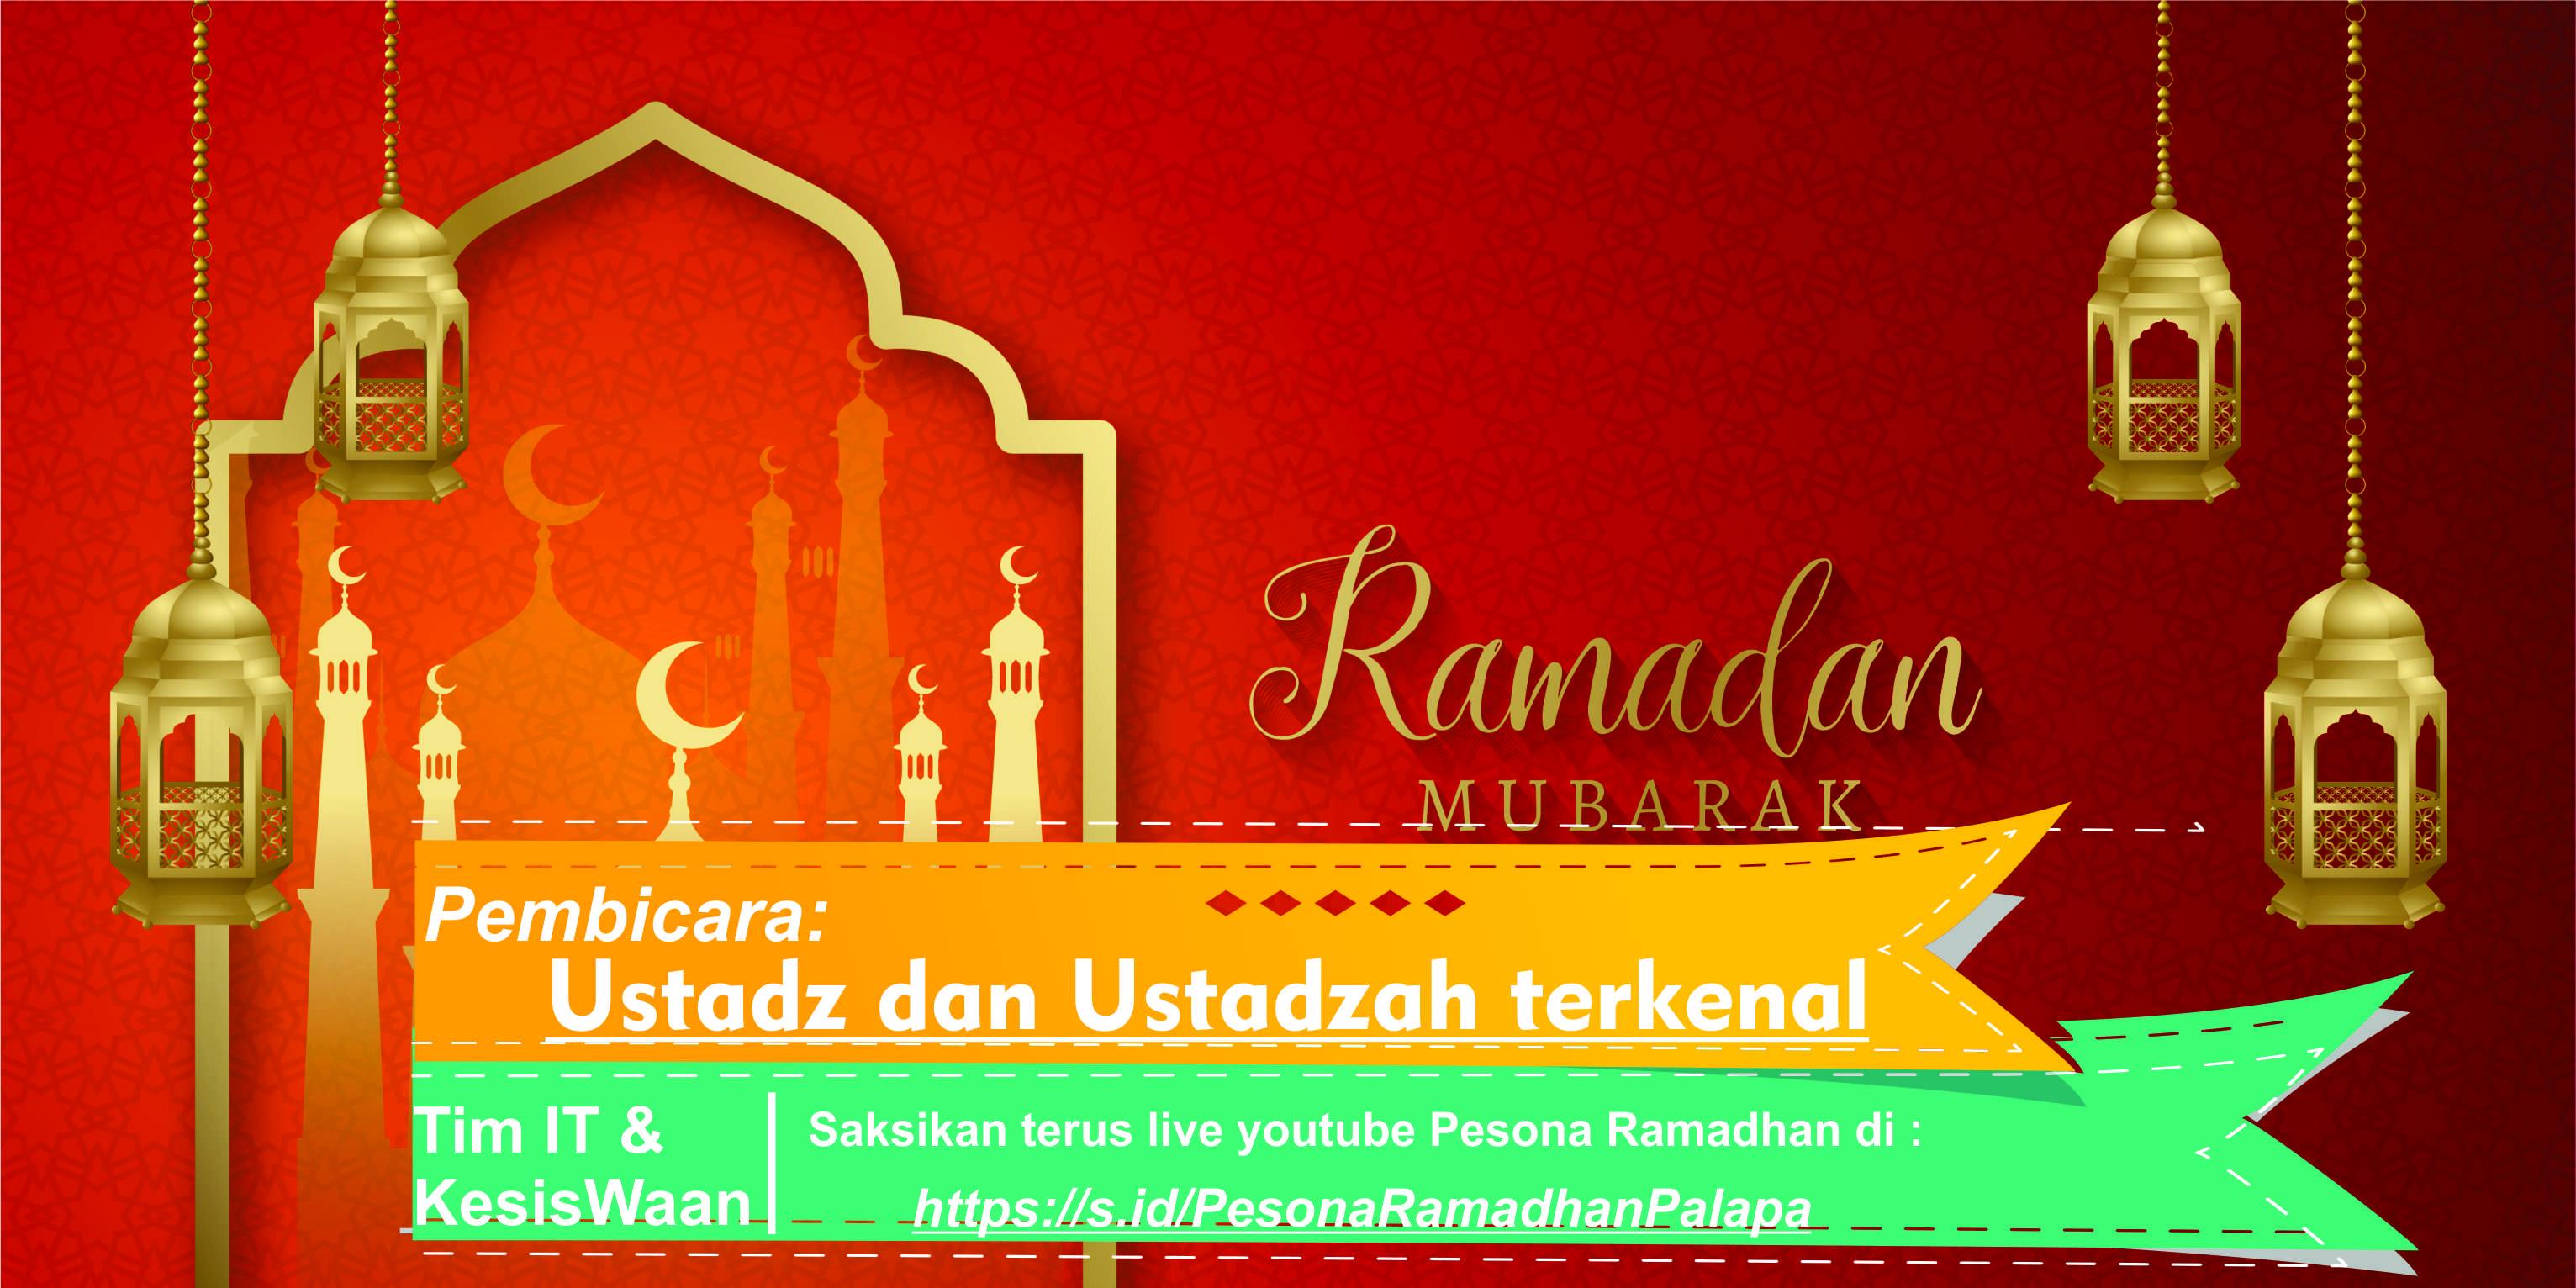 Pesona Ramadhan 1442 H SMK Palapa